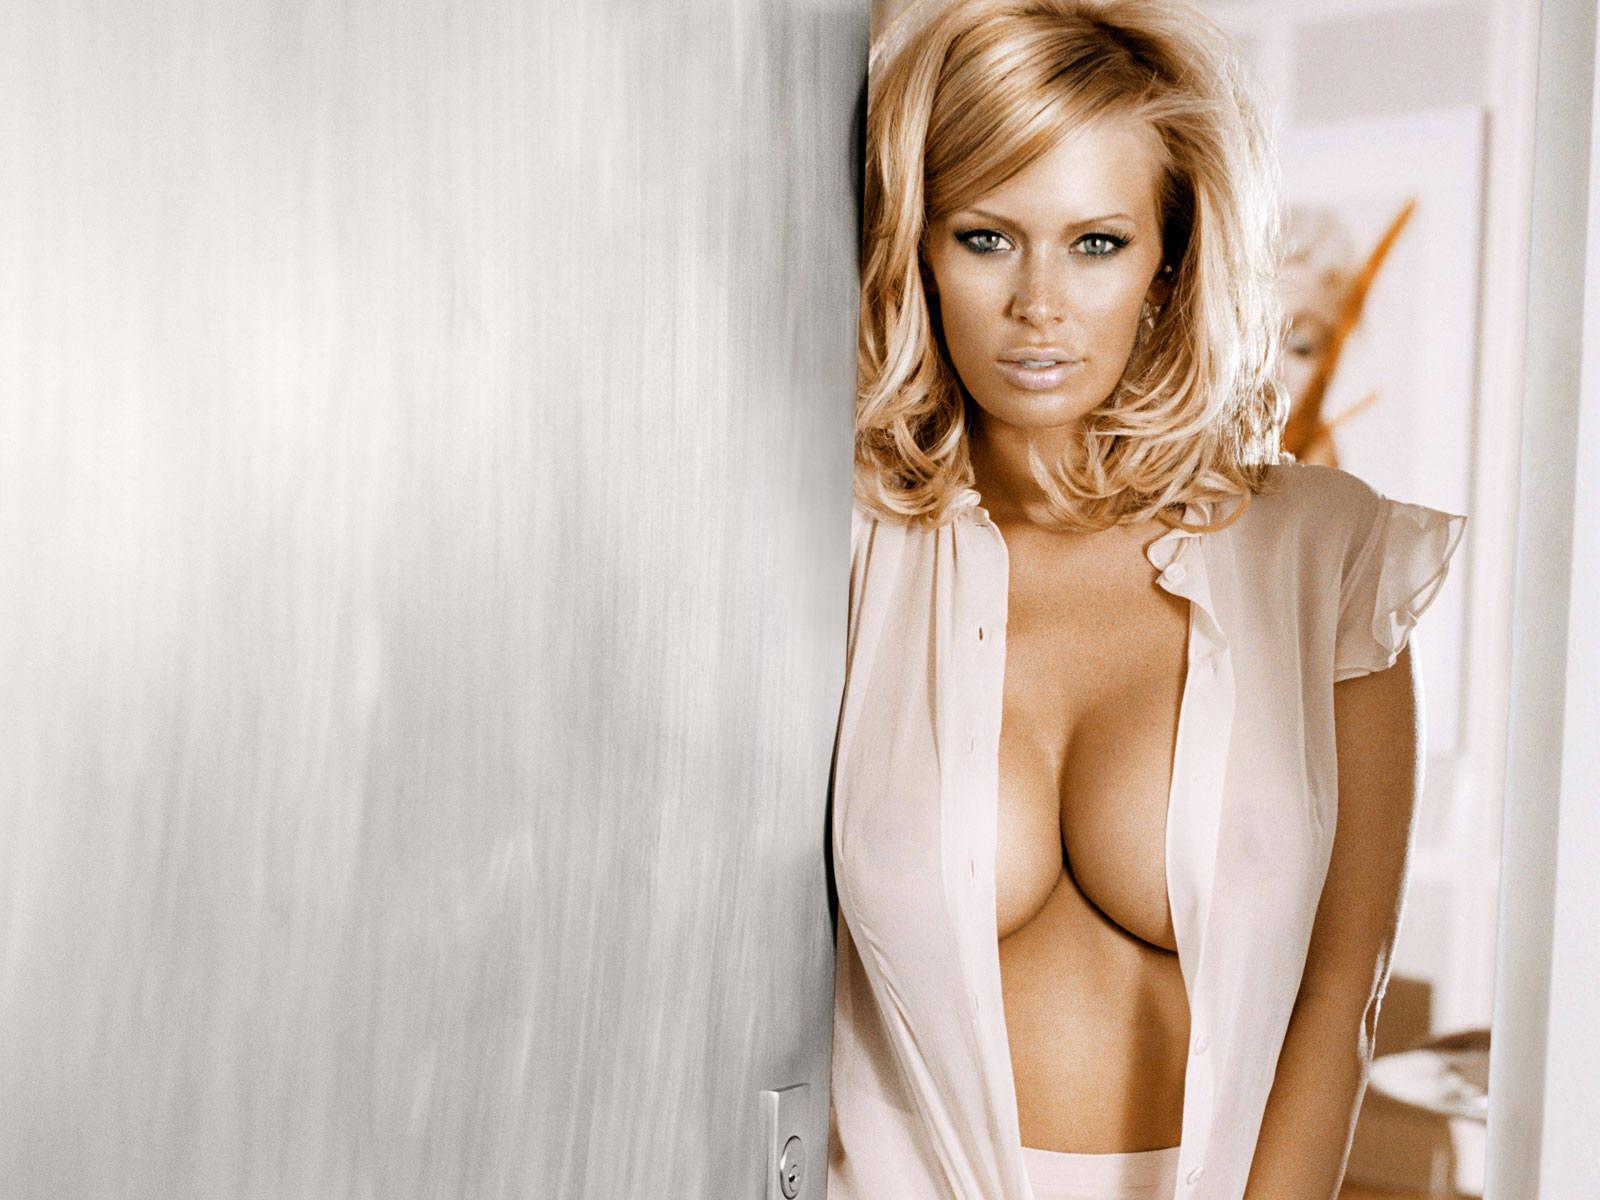 Big Tits Jenna Jameson Pornstar 2011 Download Wallpapers Res 1600 Px X 1200px